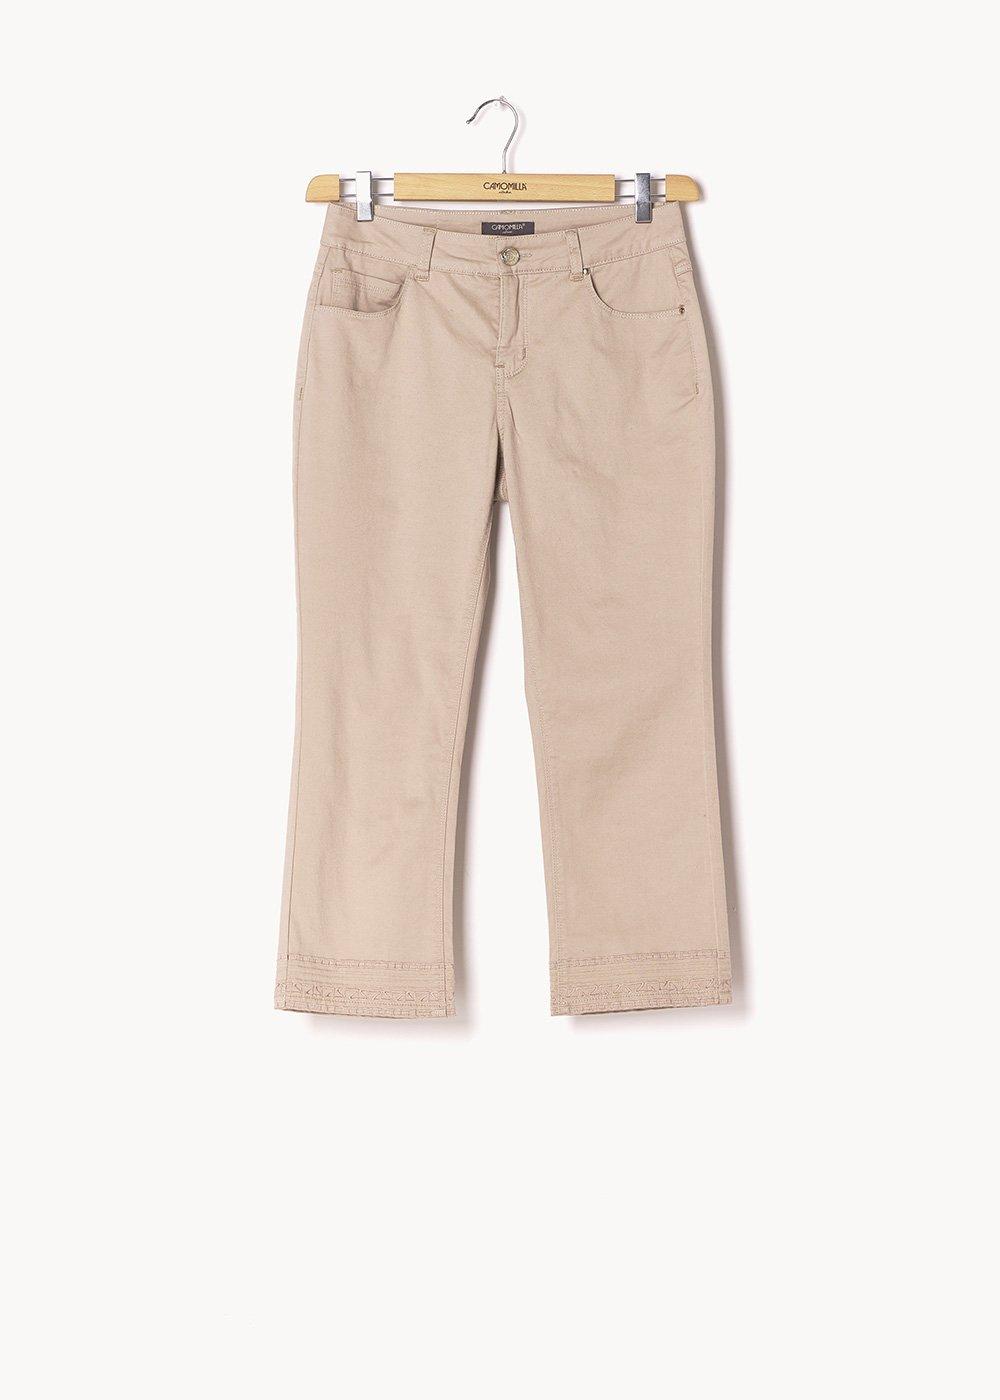 Primo capri pants with broderie anglaise detail - Safari - Woman